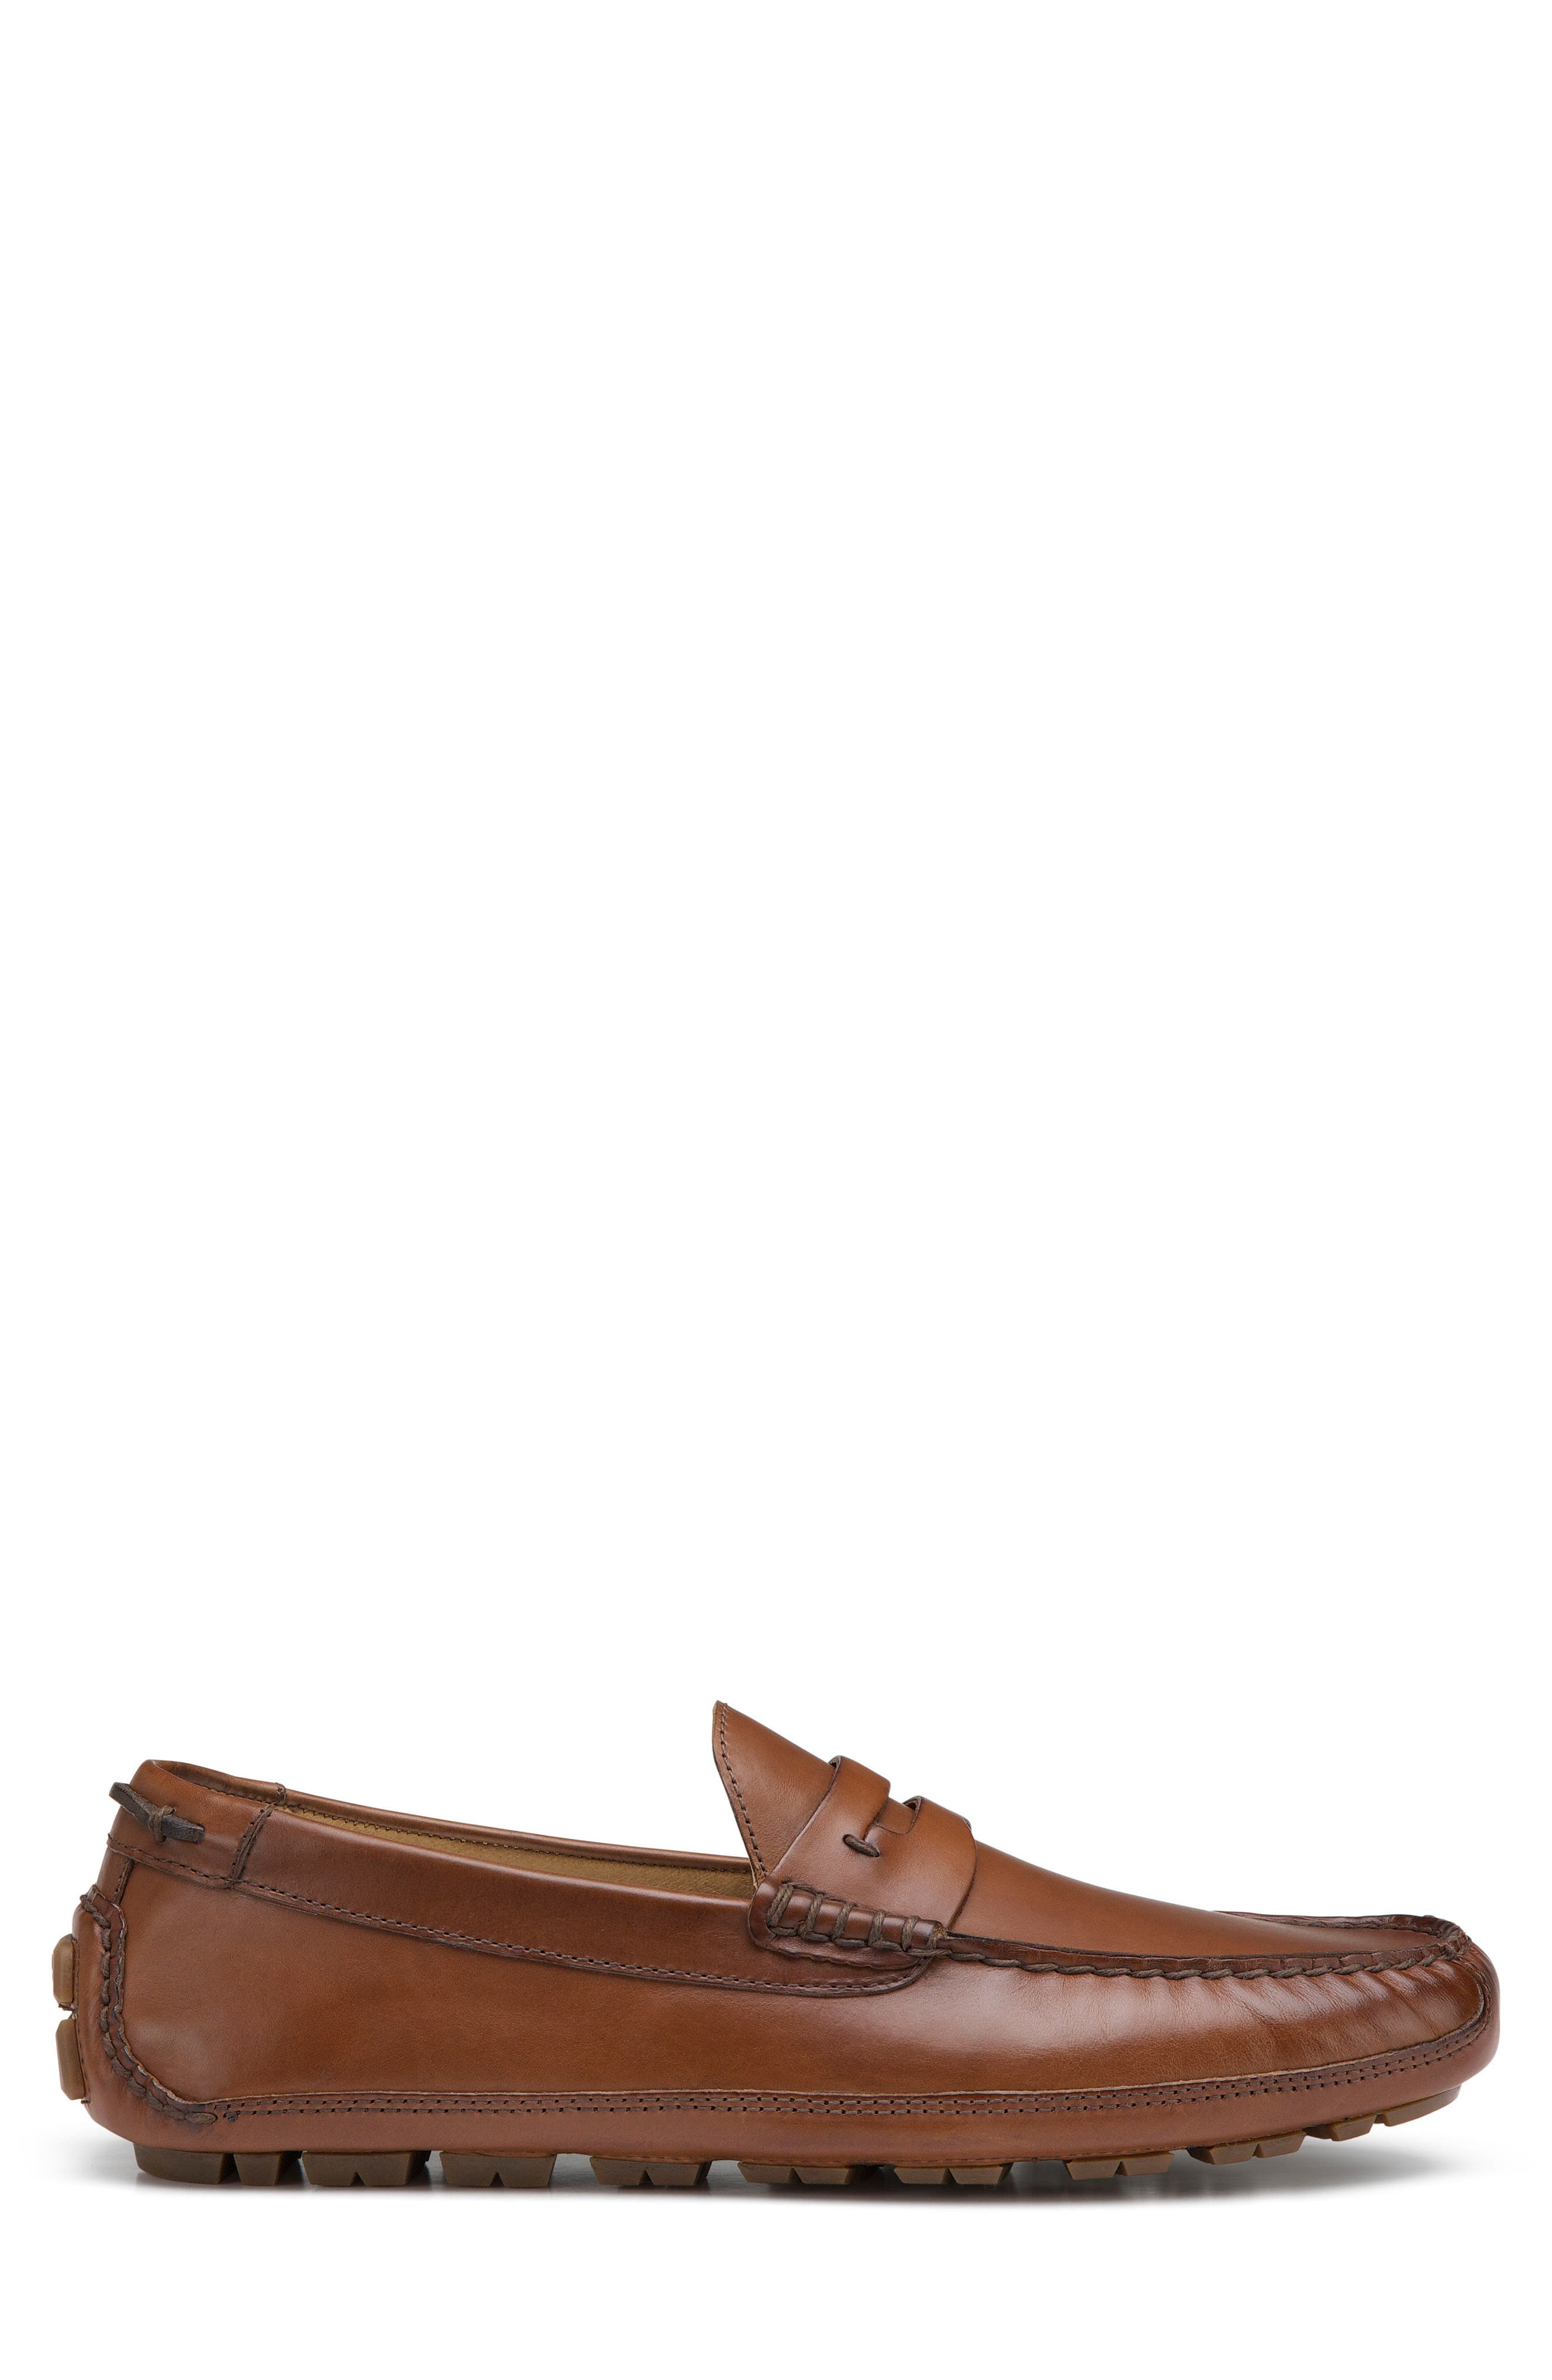 Alternate Image 3  - Trask Dawson Water Resistant Driving Loafer (Men)